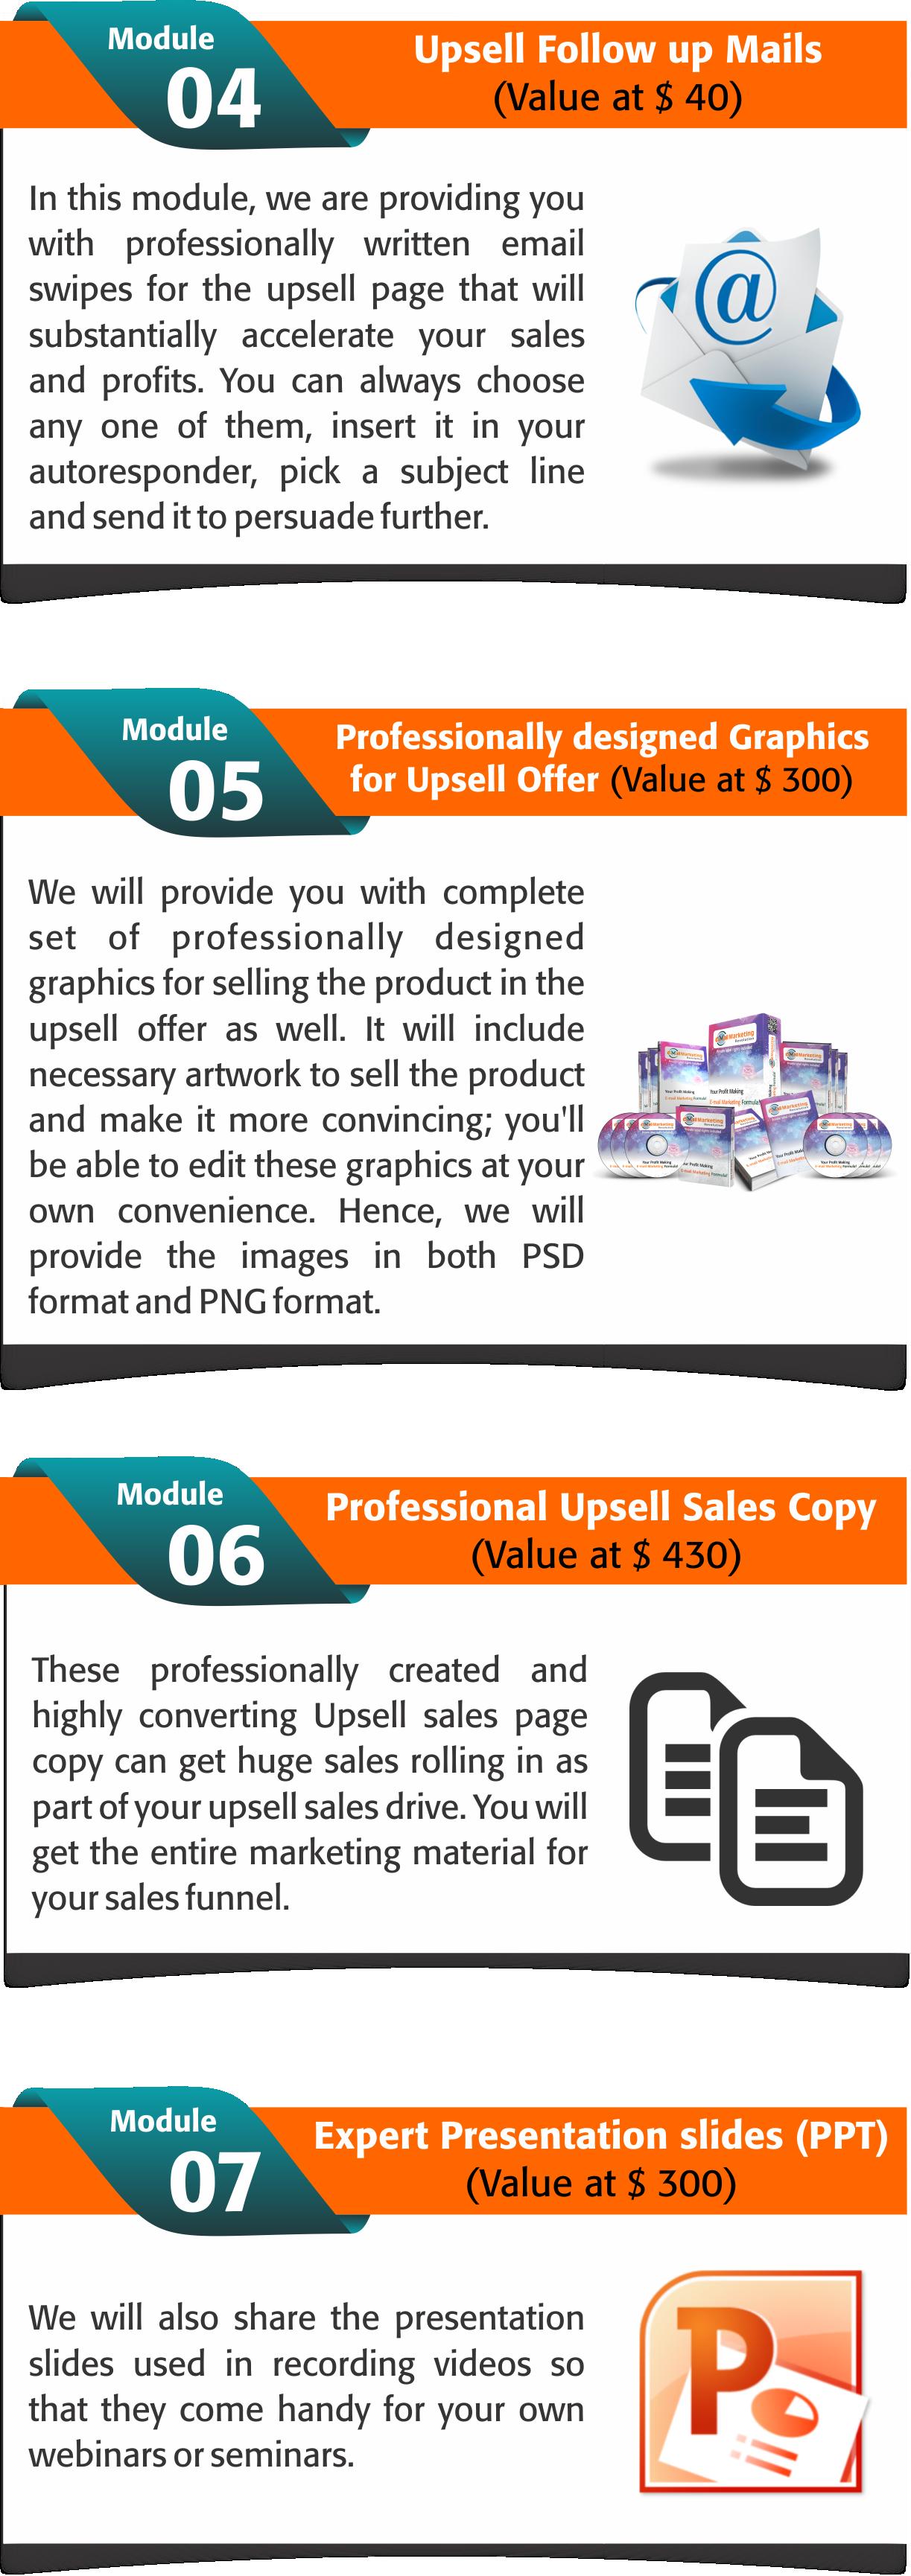 upsell-image-4